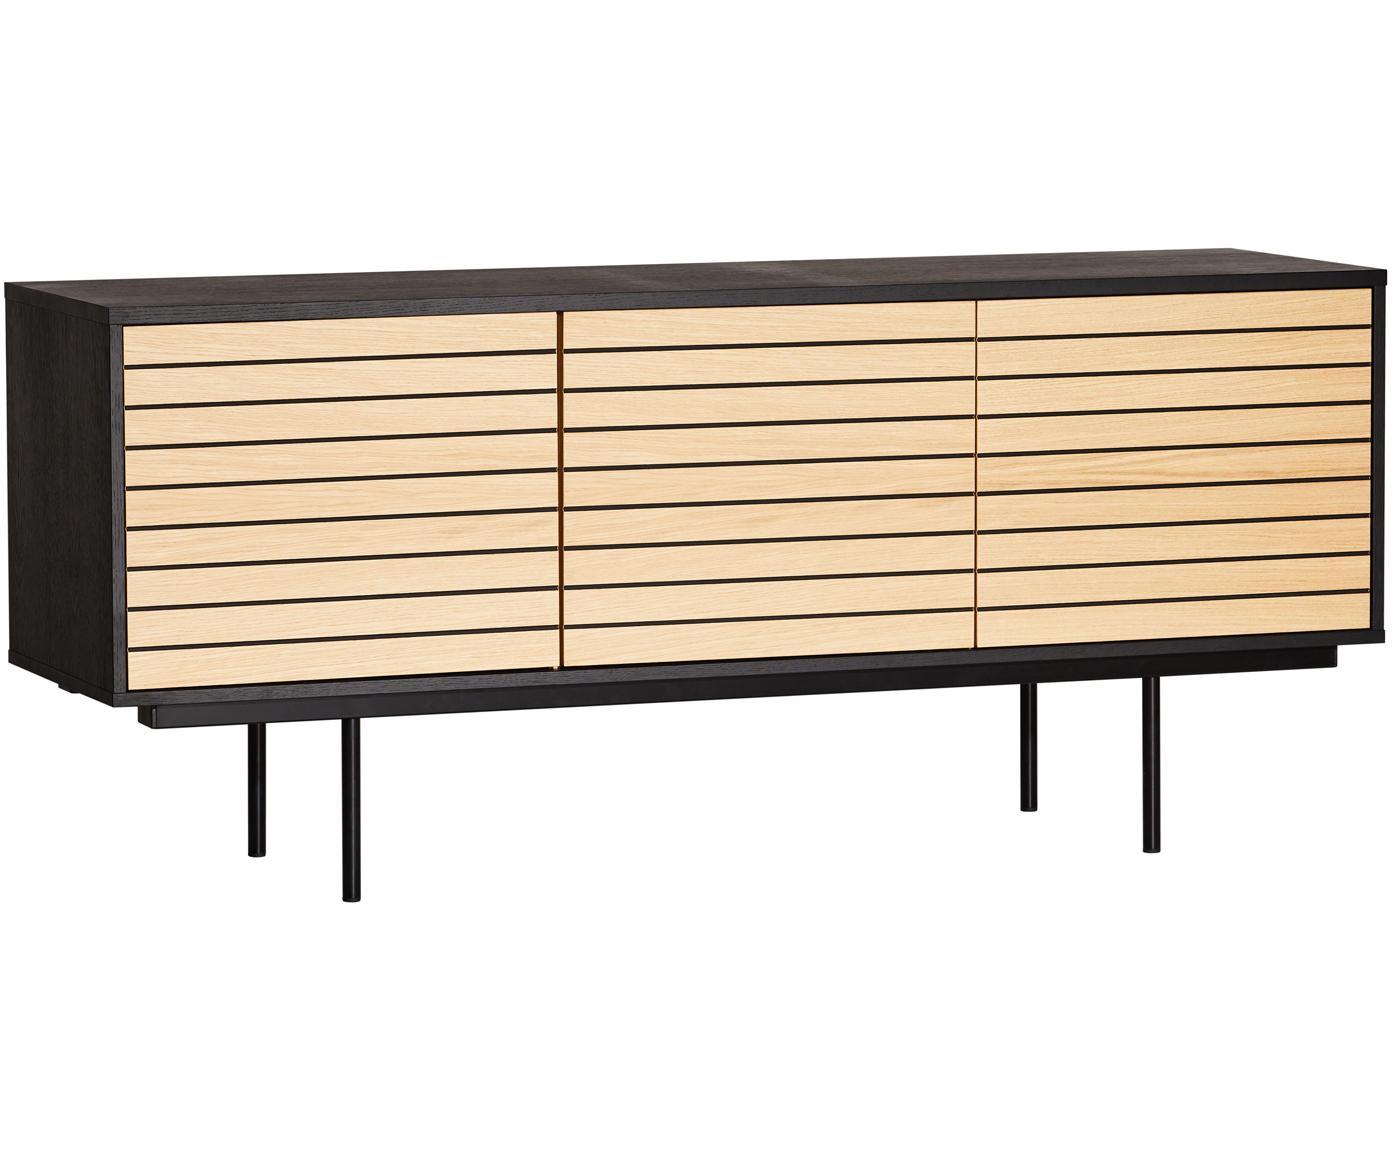 Aparador en roble Stripe, Estructura: tablero de fibras de dens, Patas: metal, pintura en polvo, Roble, negro, An 161 x Al 70 cm